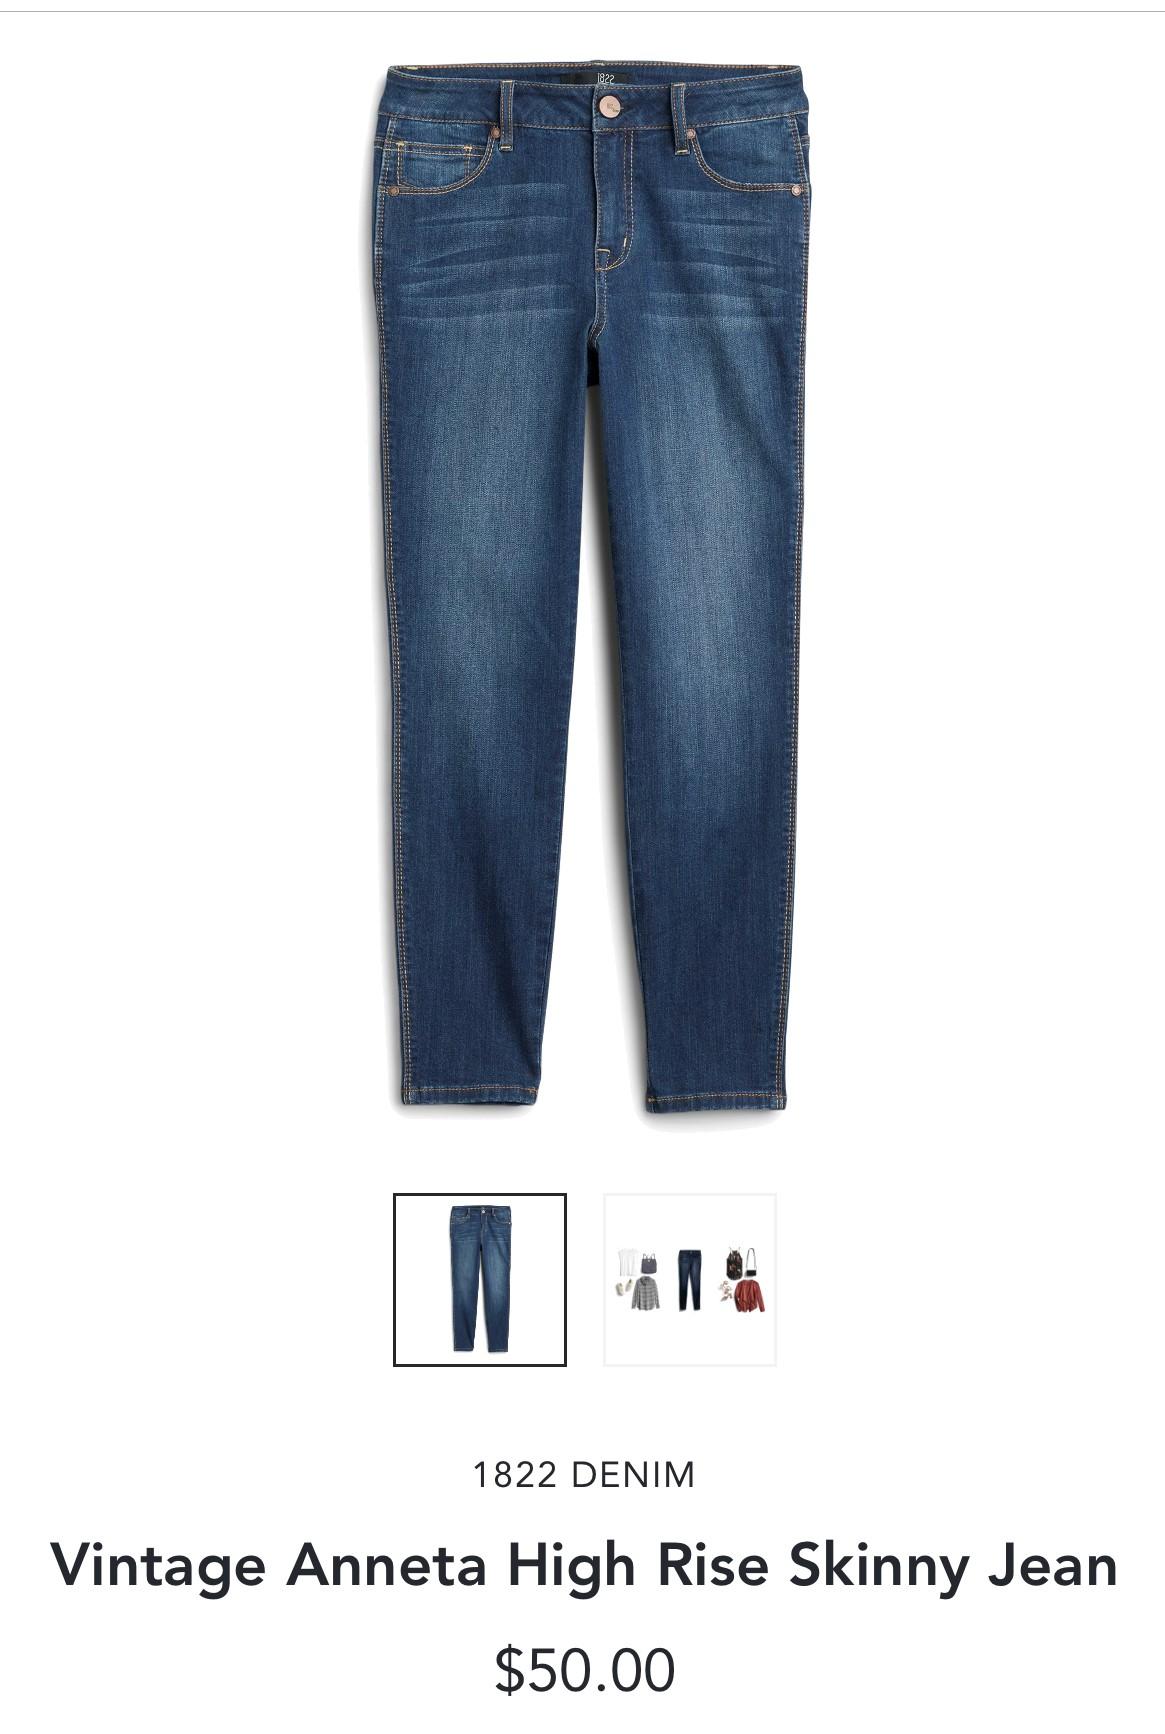 Stitch Fix 1822 Denim Vintage Anneta High Rise Skinny Jean